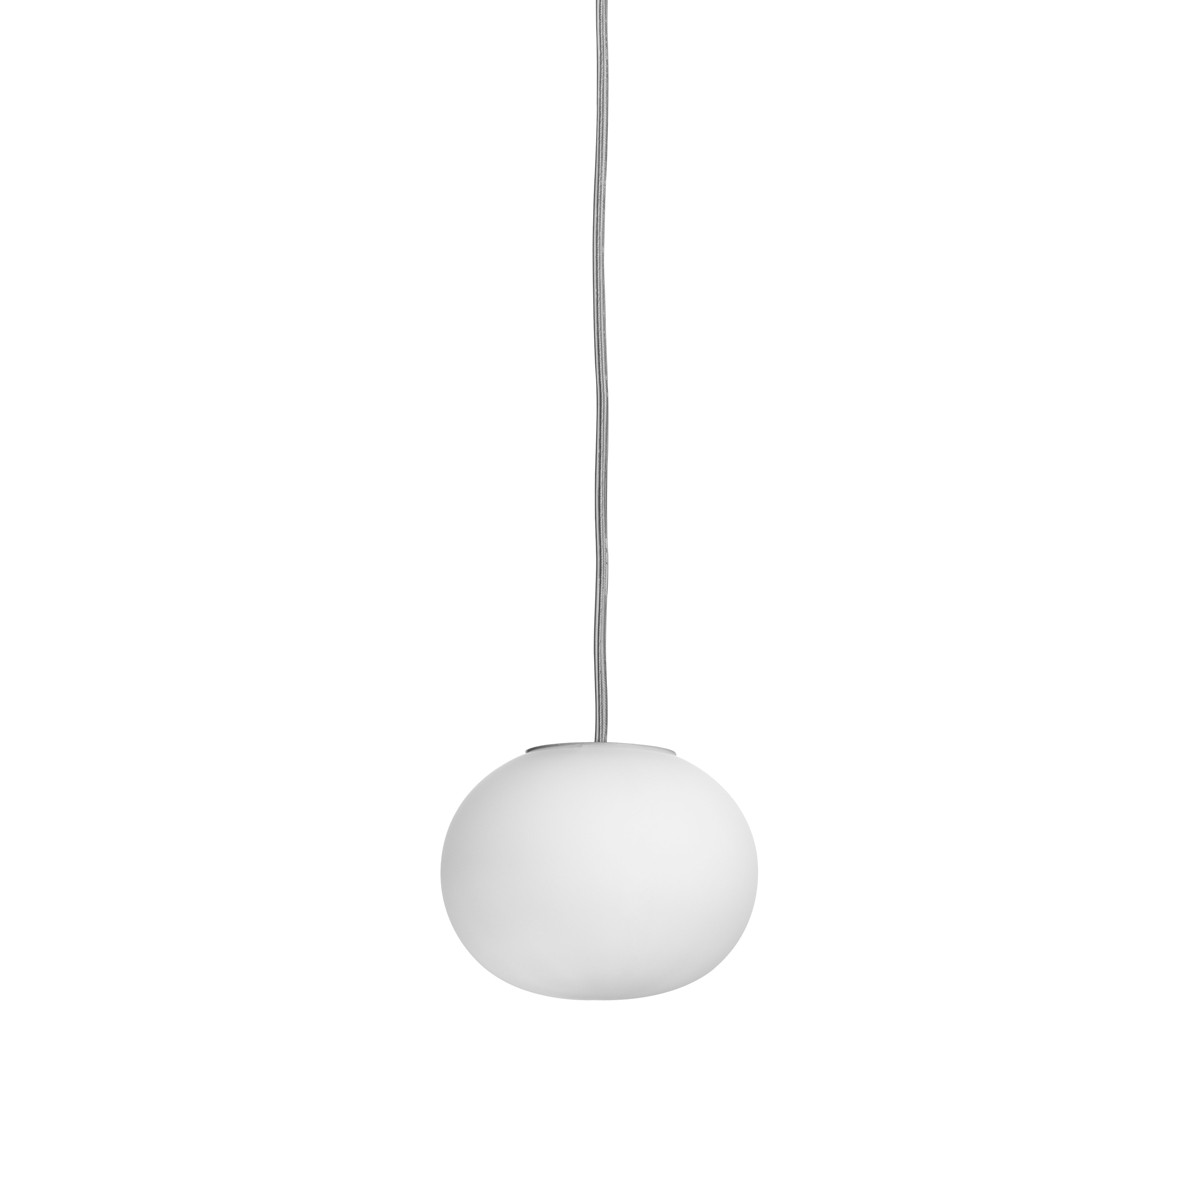 Flos Mini Glo-Ball S Pendelleuchte, Ø: 11,2 cm, weiß